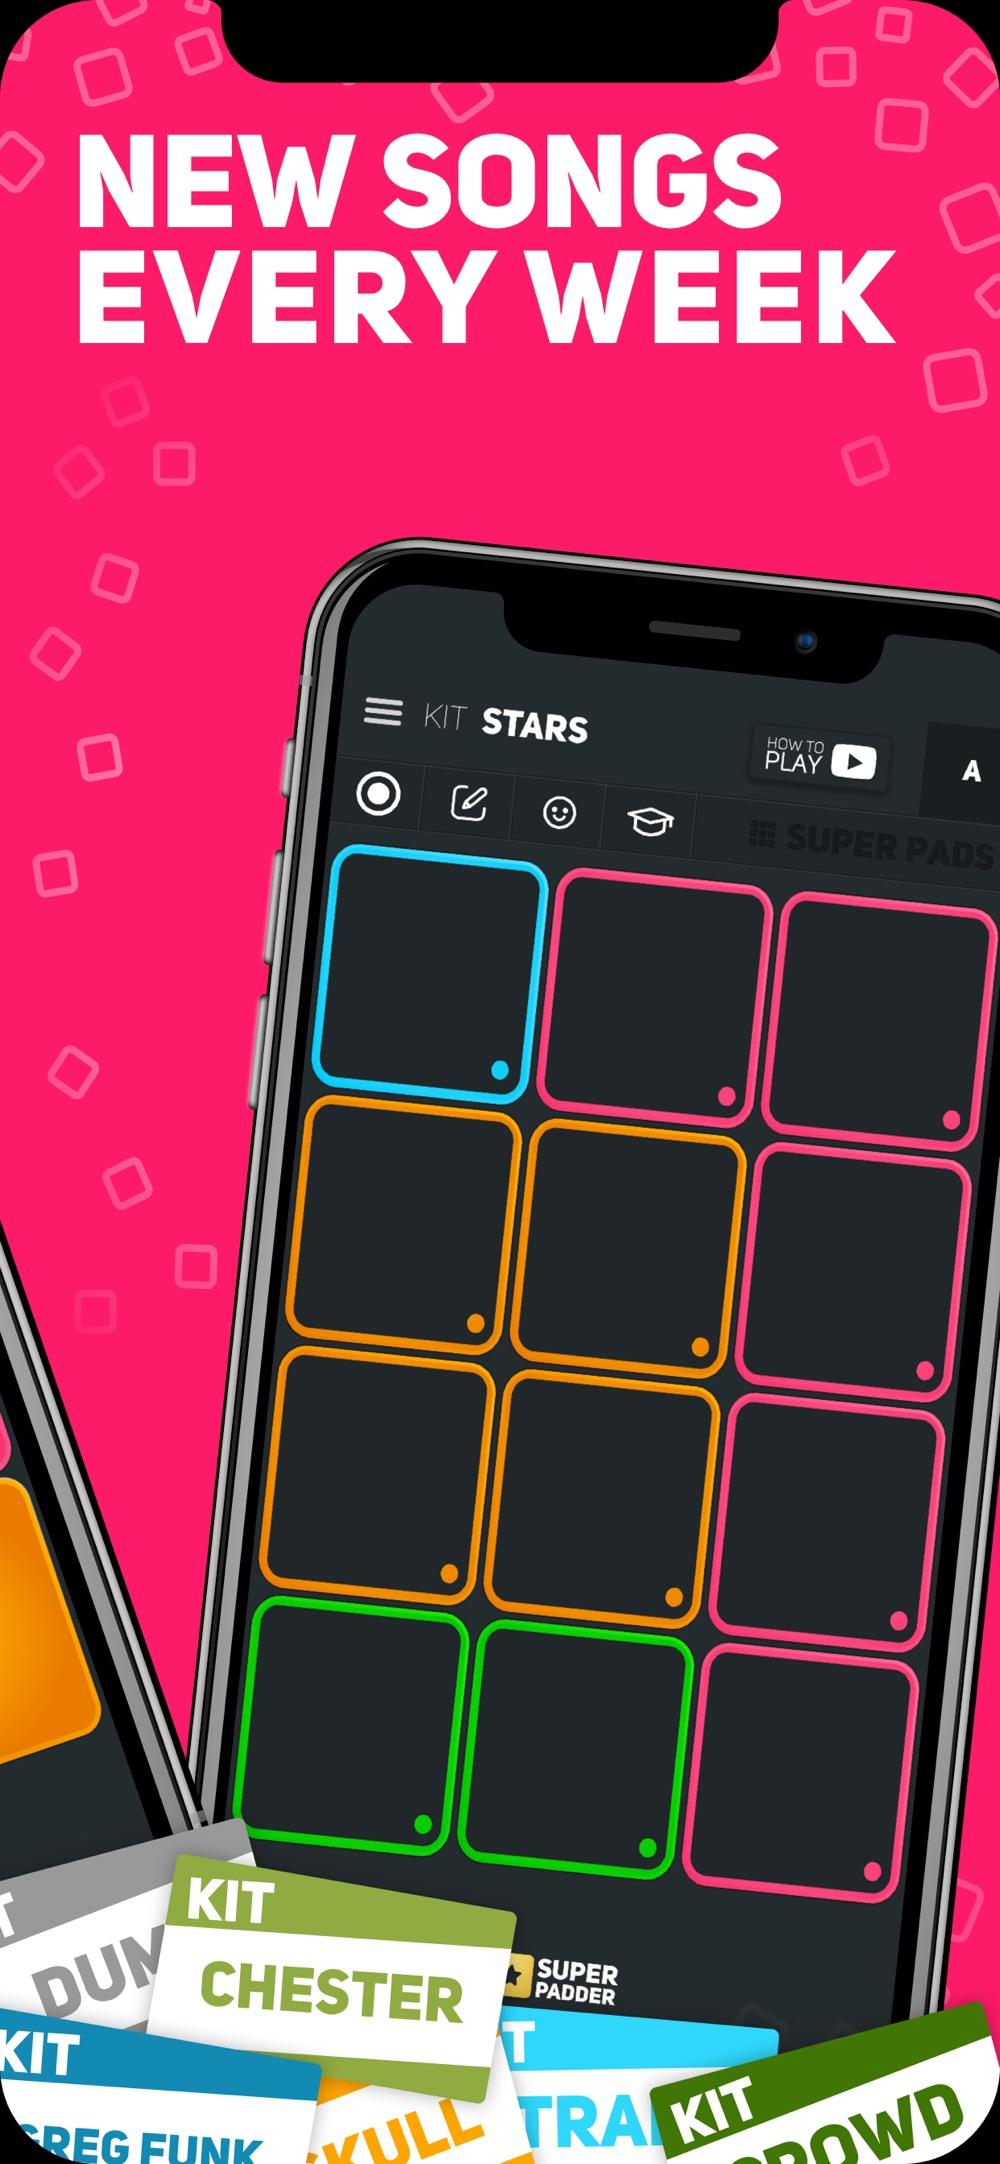 SUPER PADS - Become a DJ hack tool